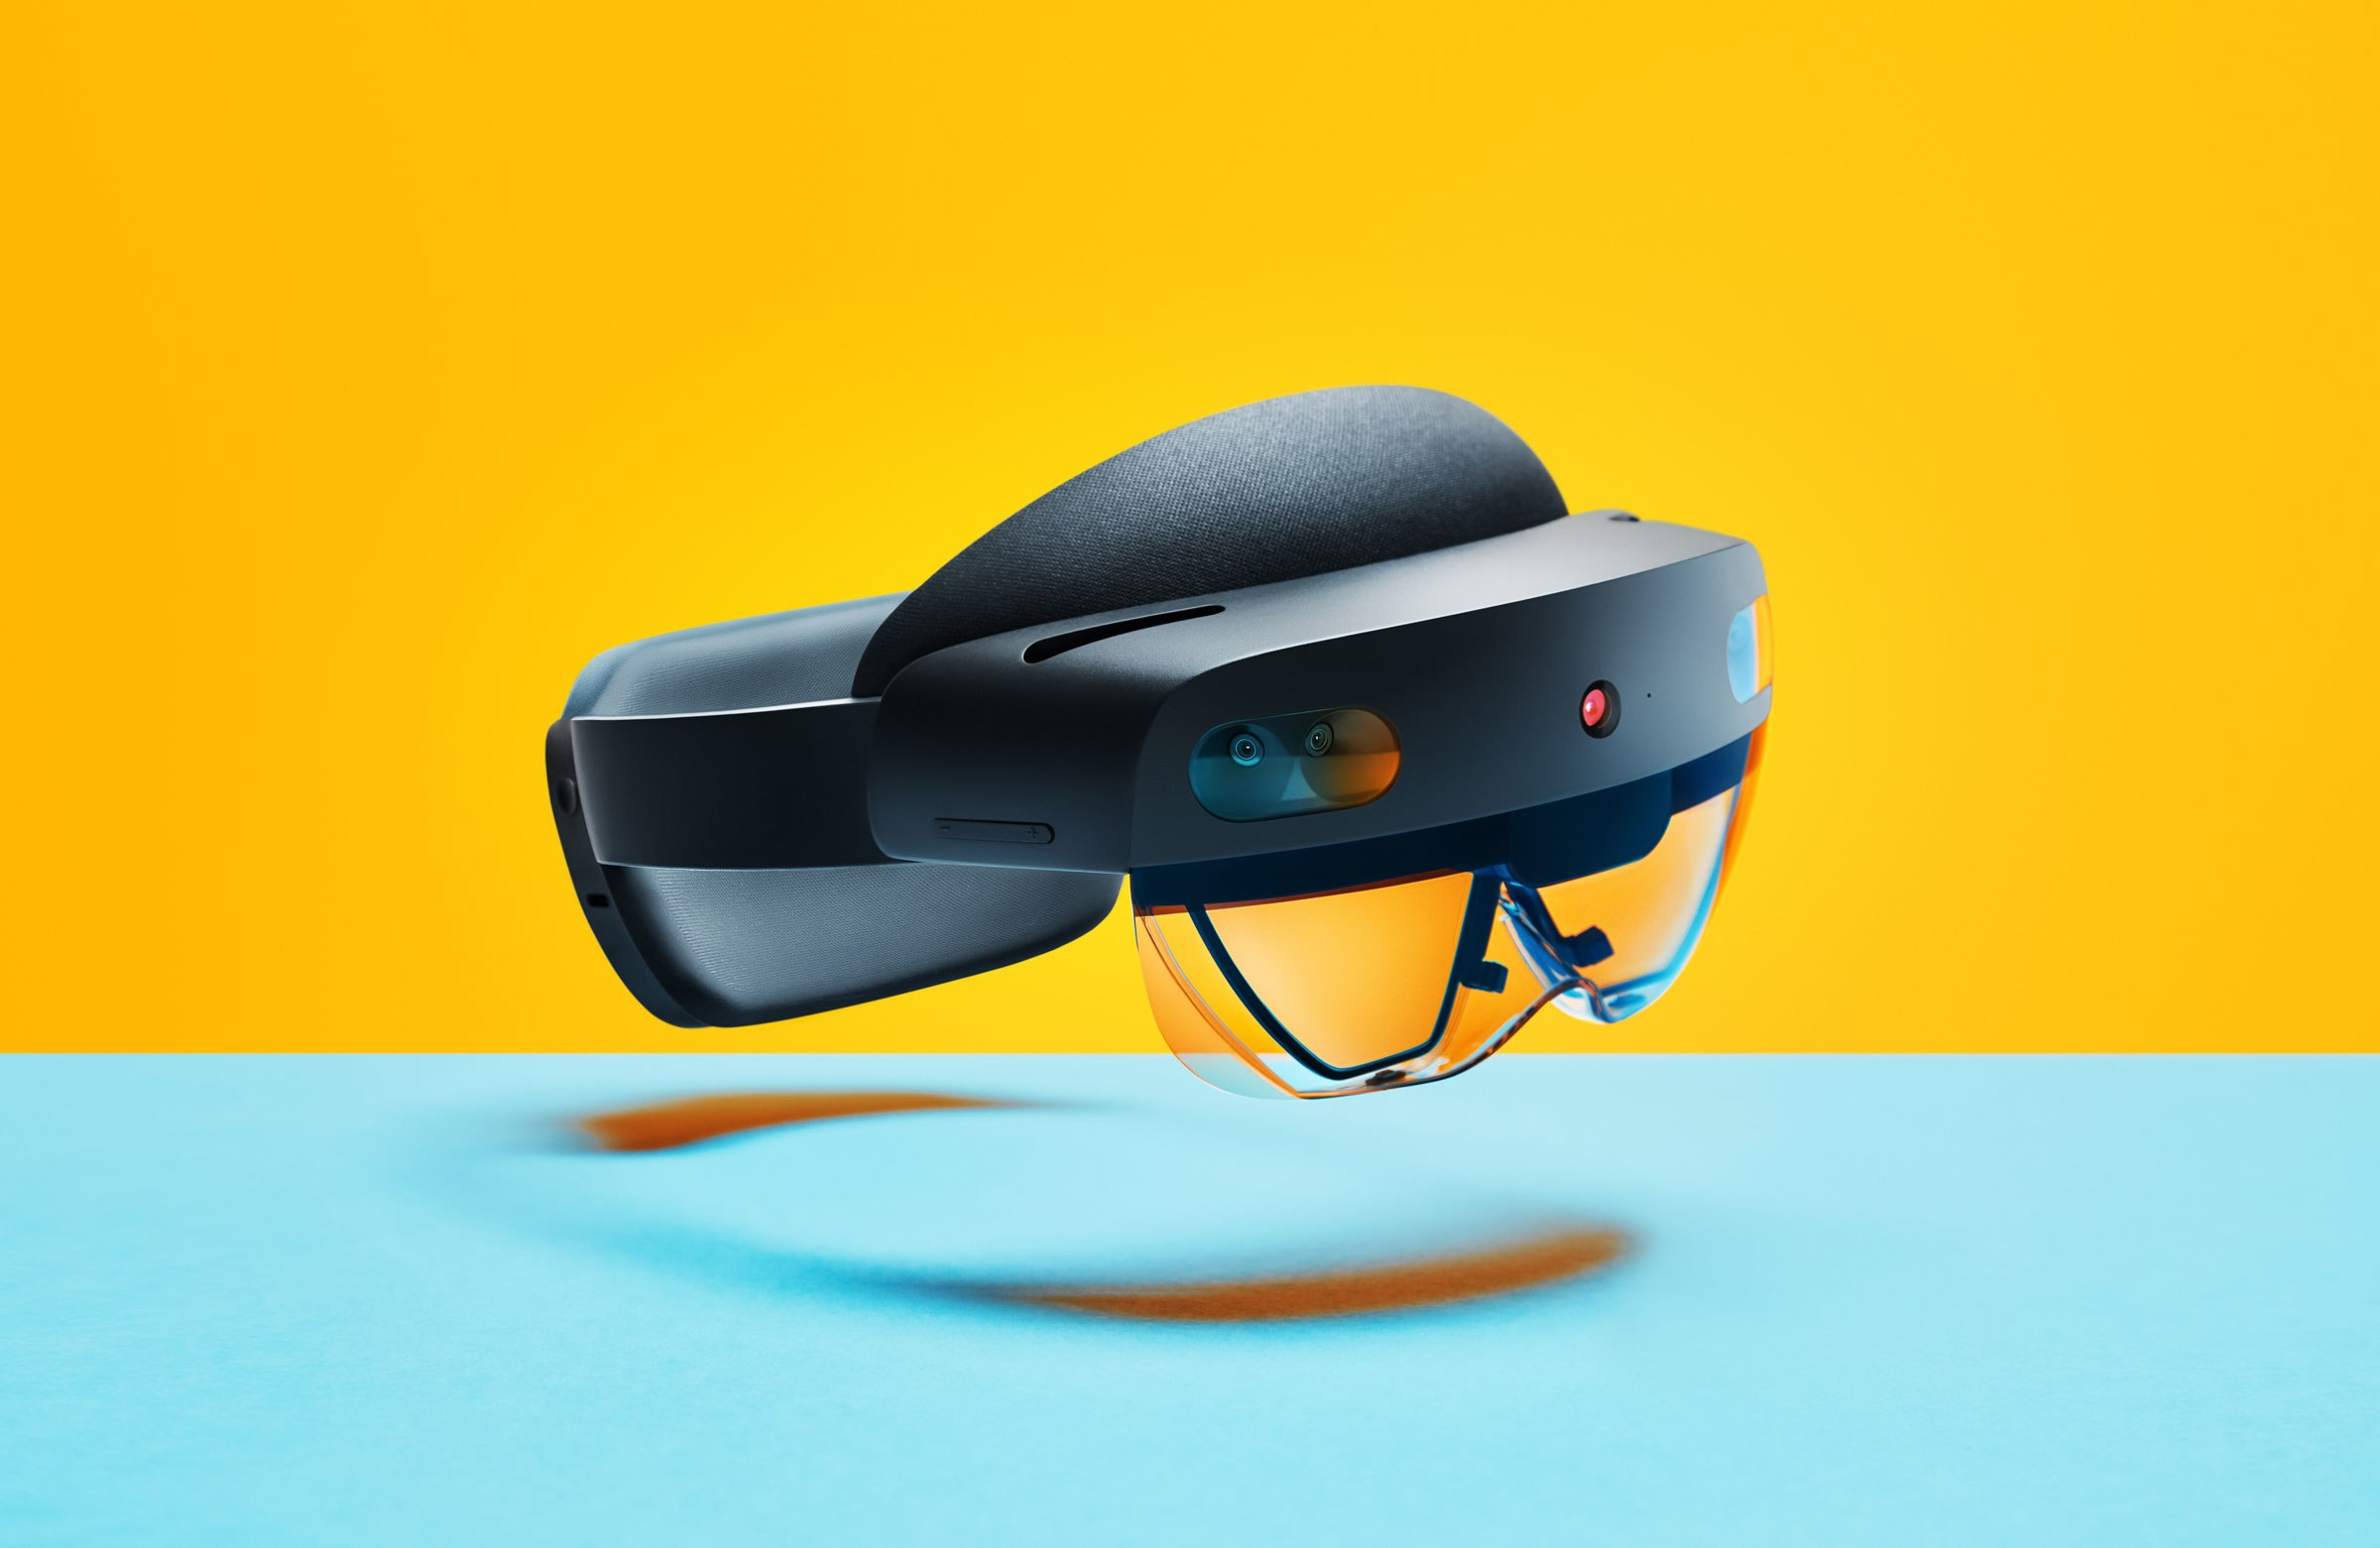 Hololens 2: A Realidade Mista da Microsoft foi oficializado